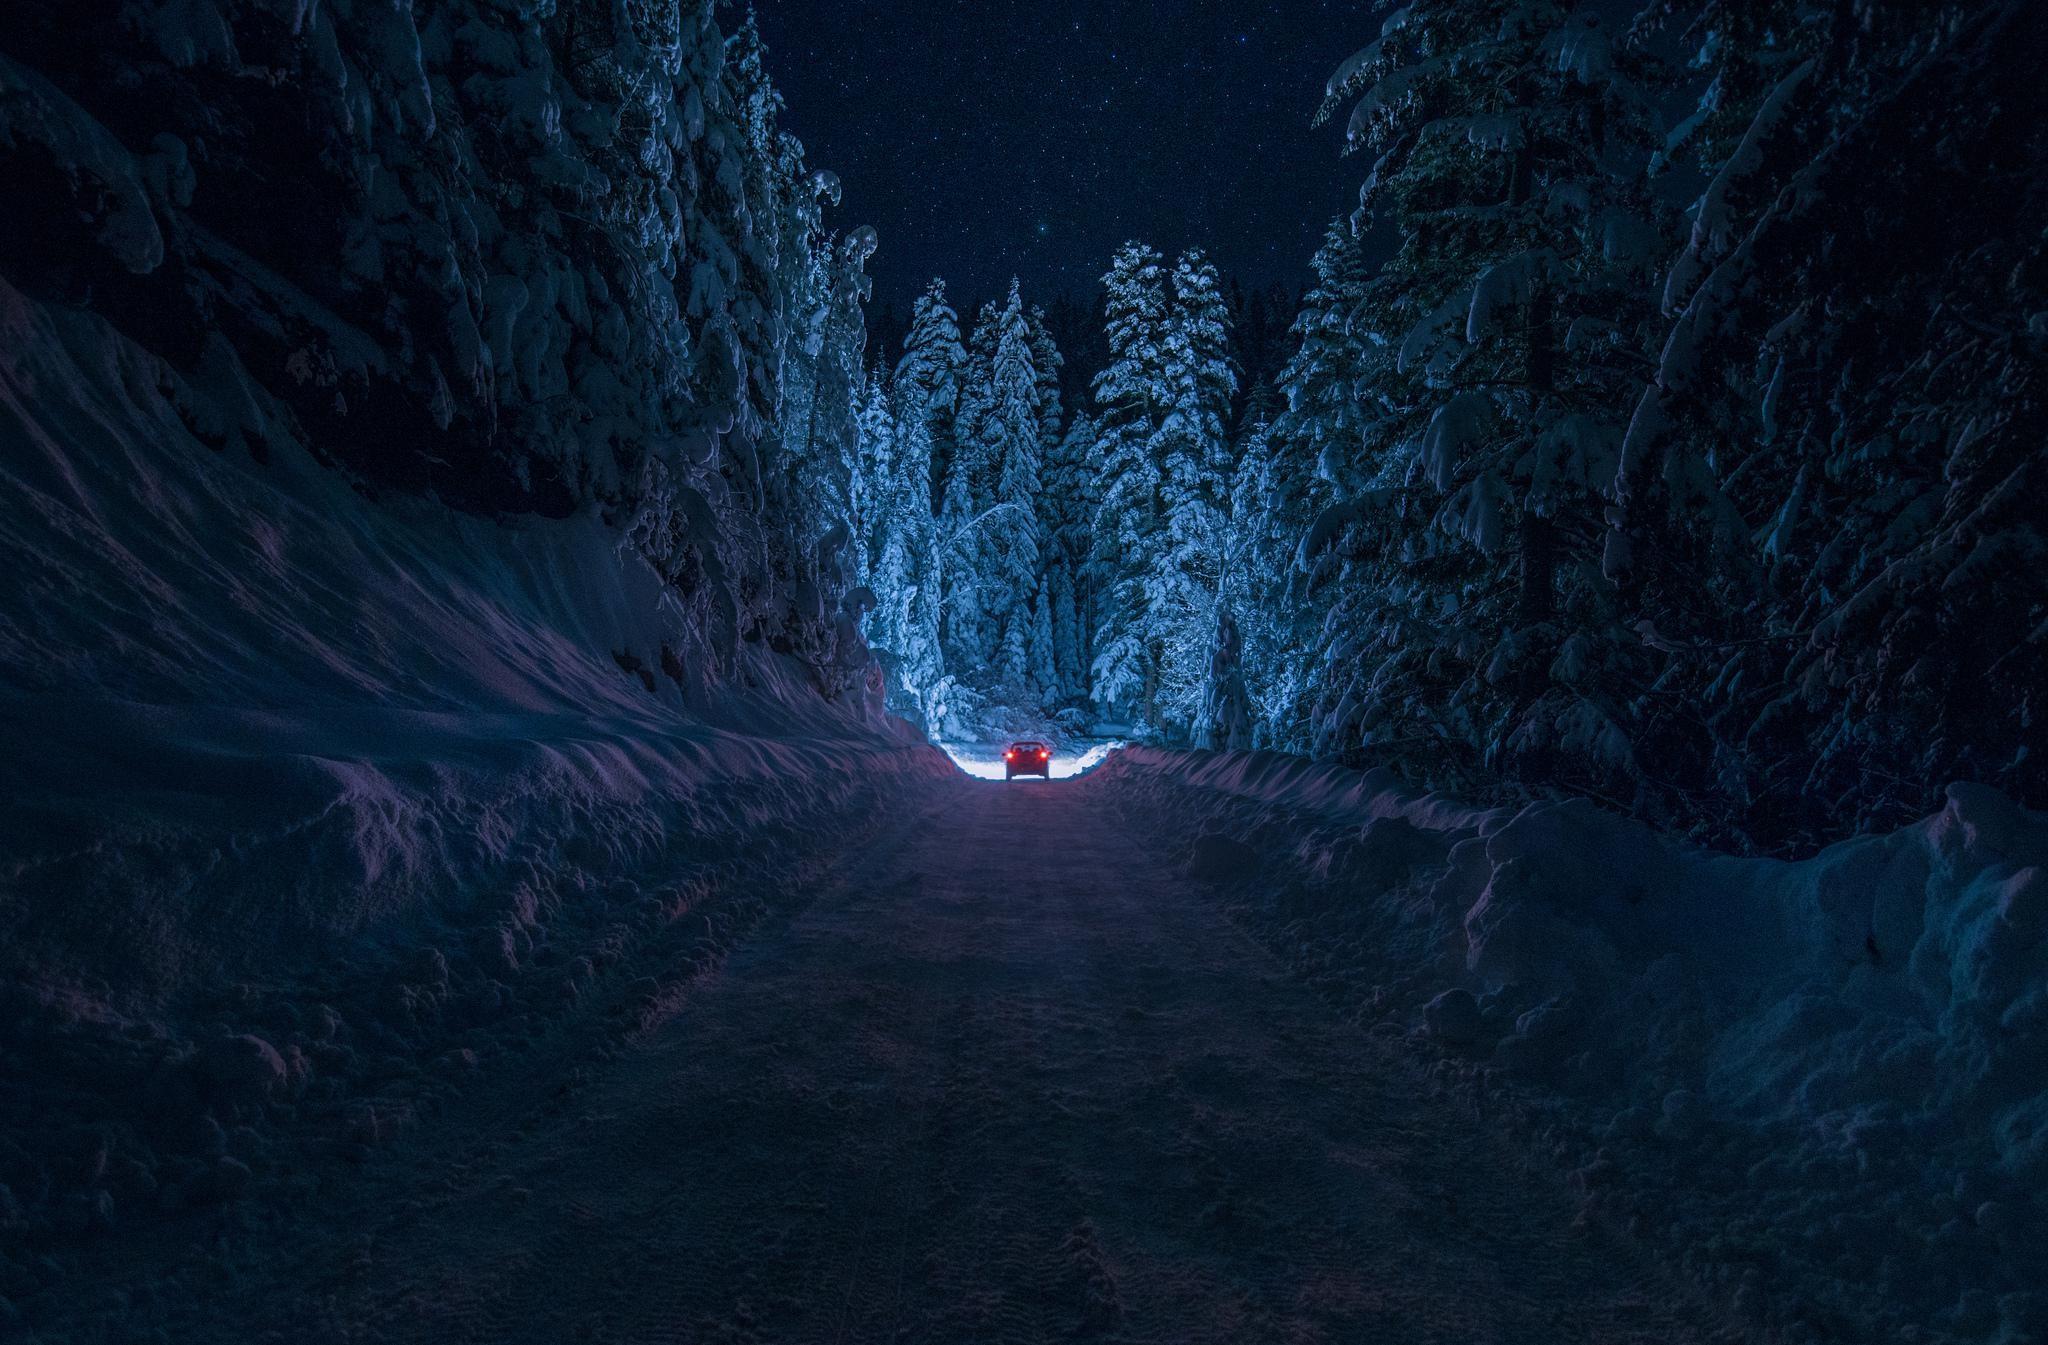 bulgaria-kyustendil-winter-road-snow-forest-night-car-